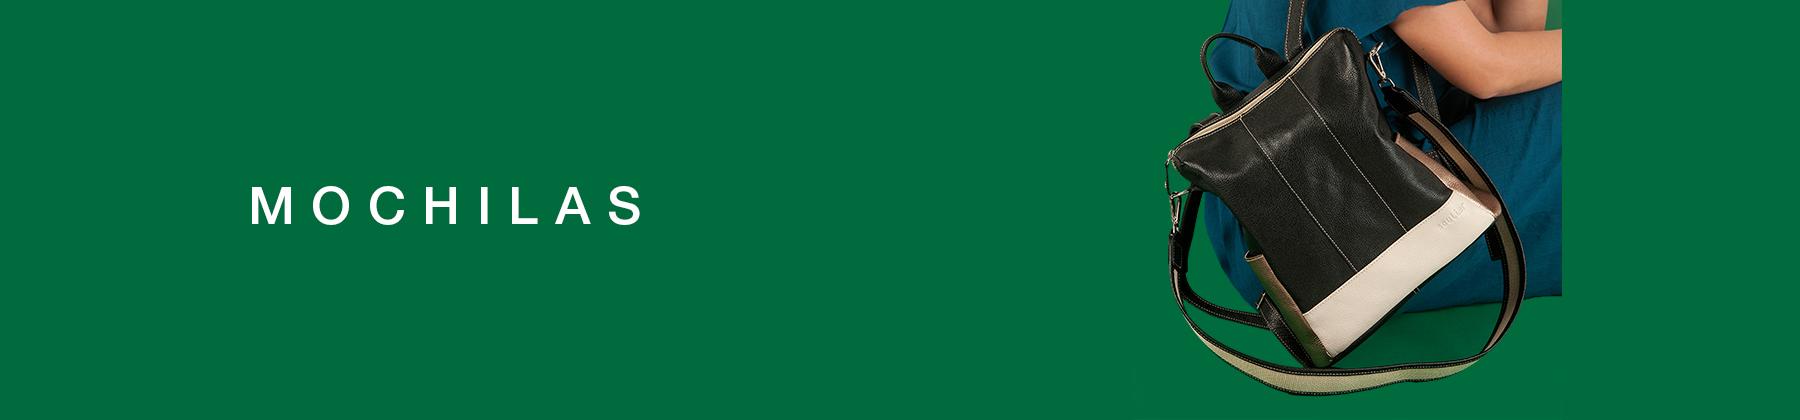 Banner-categoria